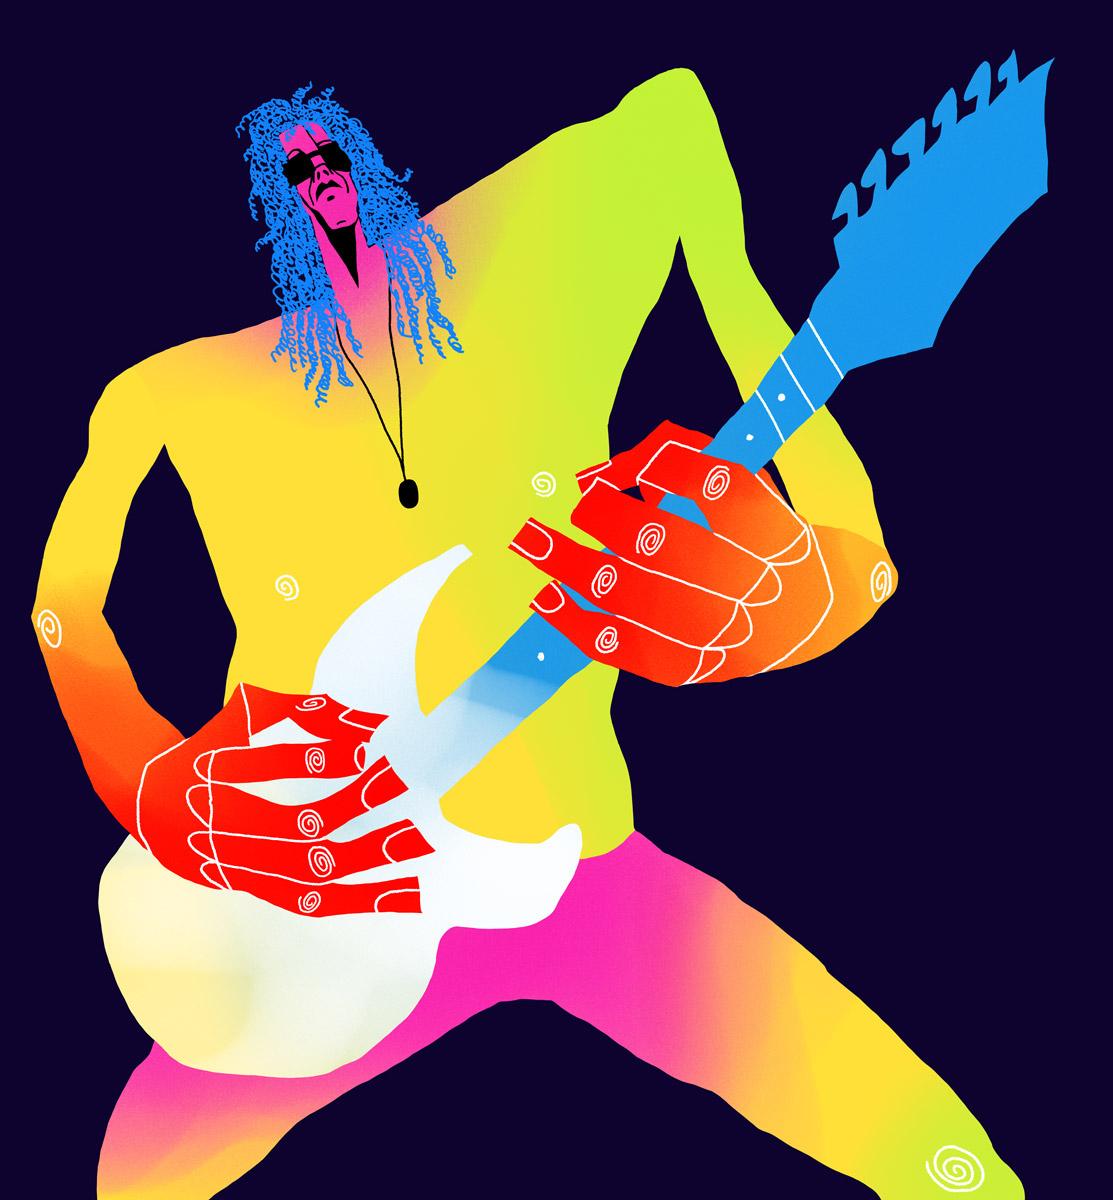 Electrified by Rock